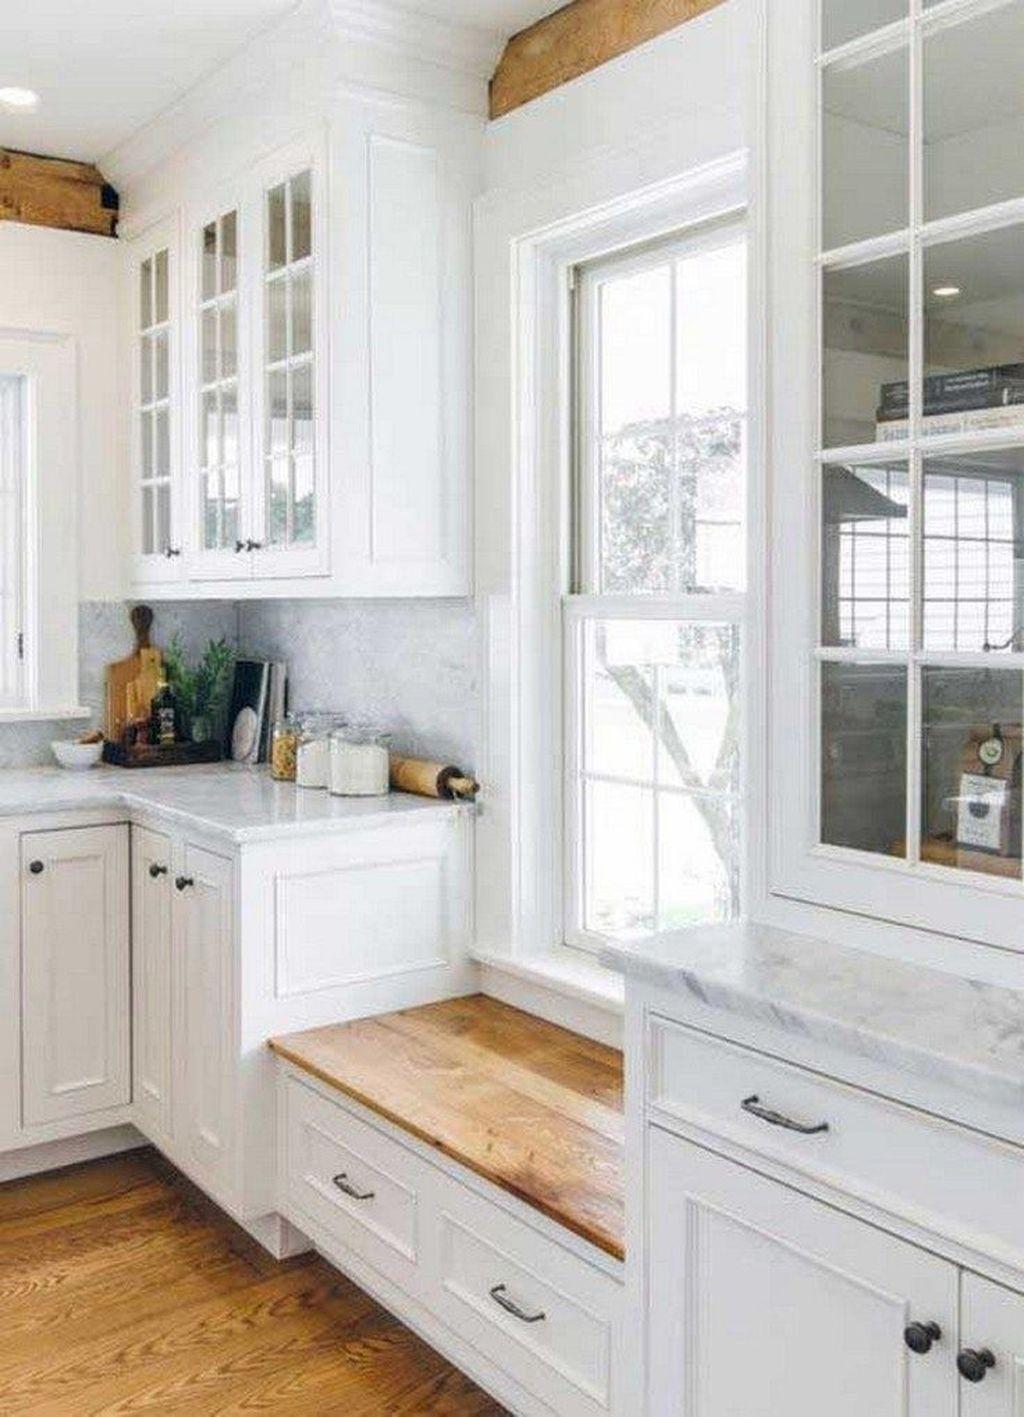 Brilliant Small Kitchen Remodel Design Ideas On A Budget 25